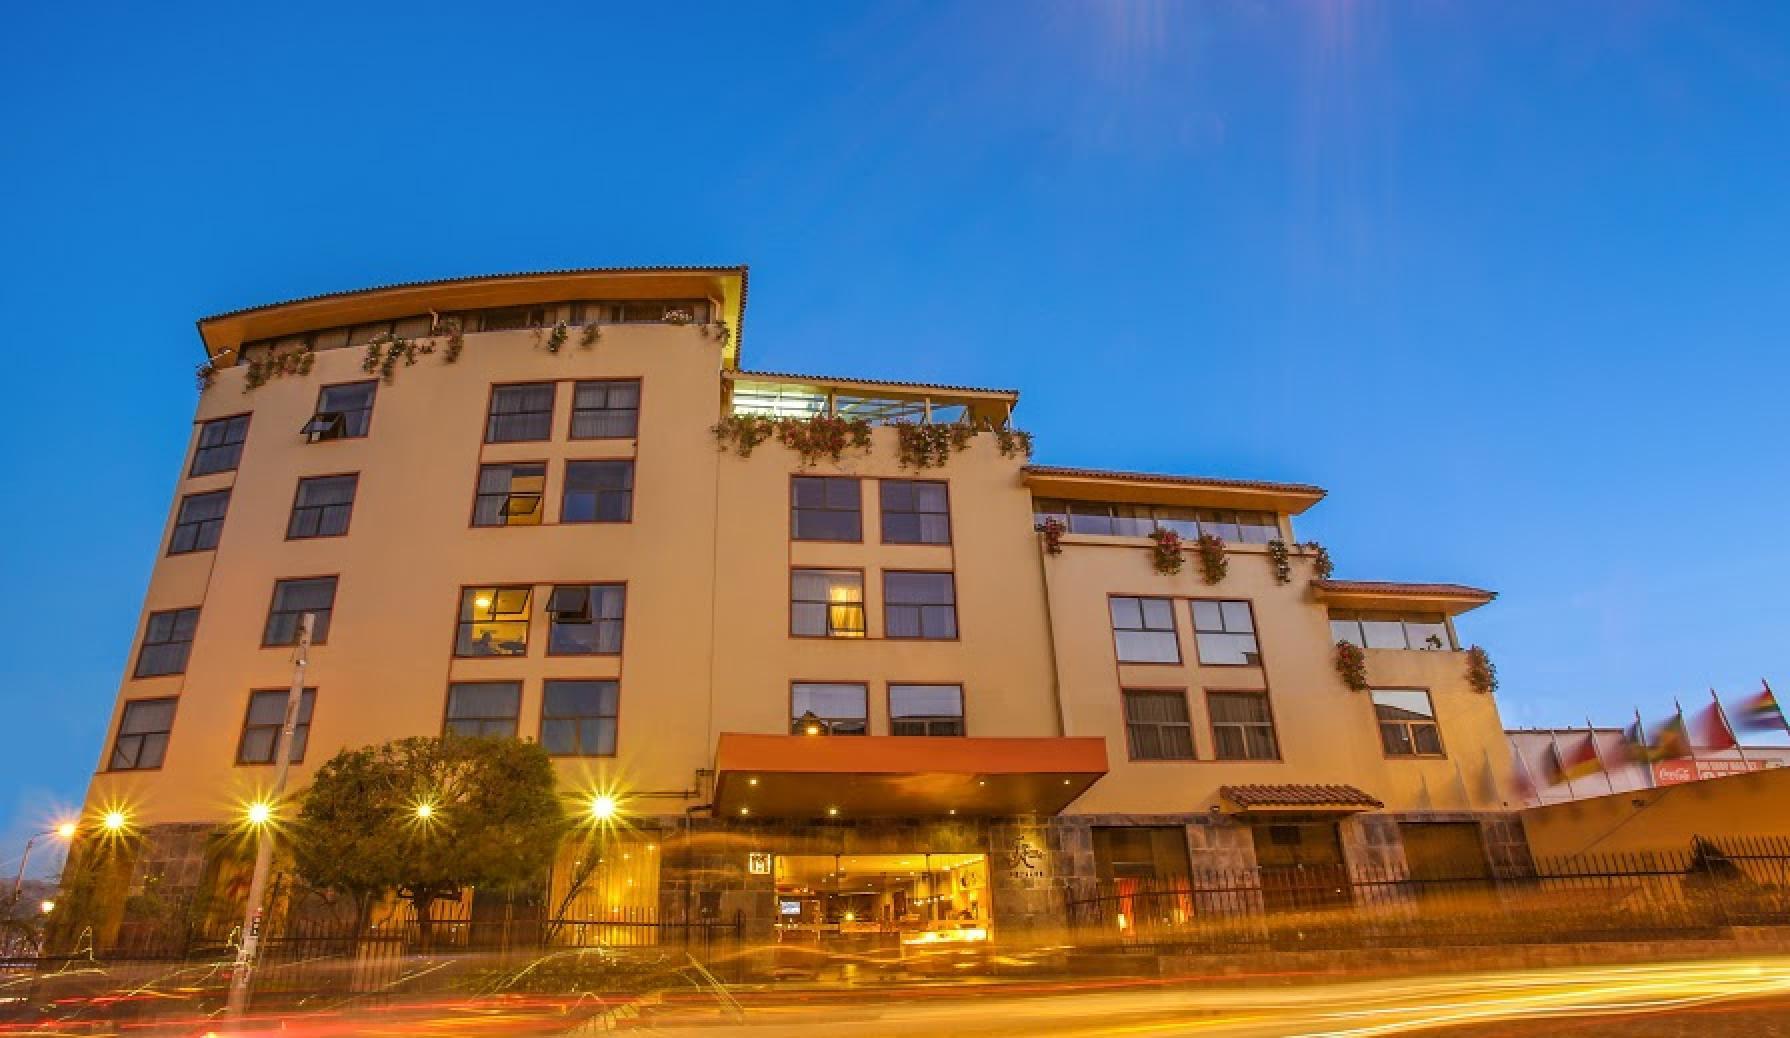 Hotel Jose Antonio